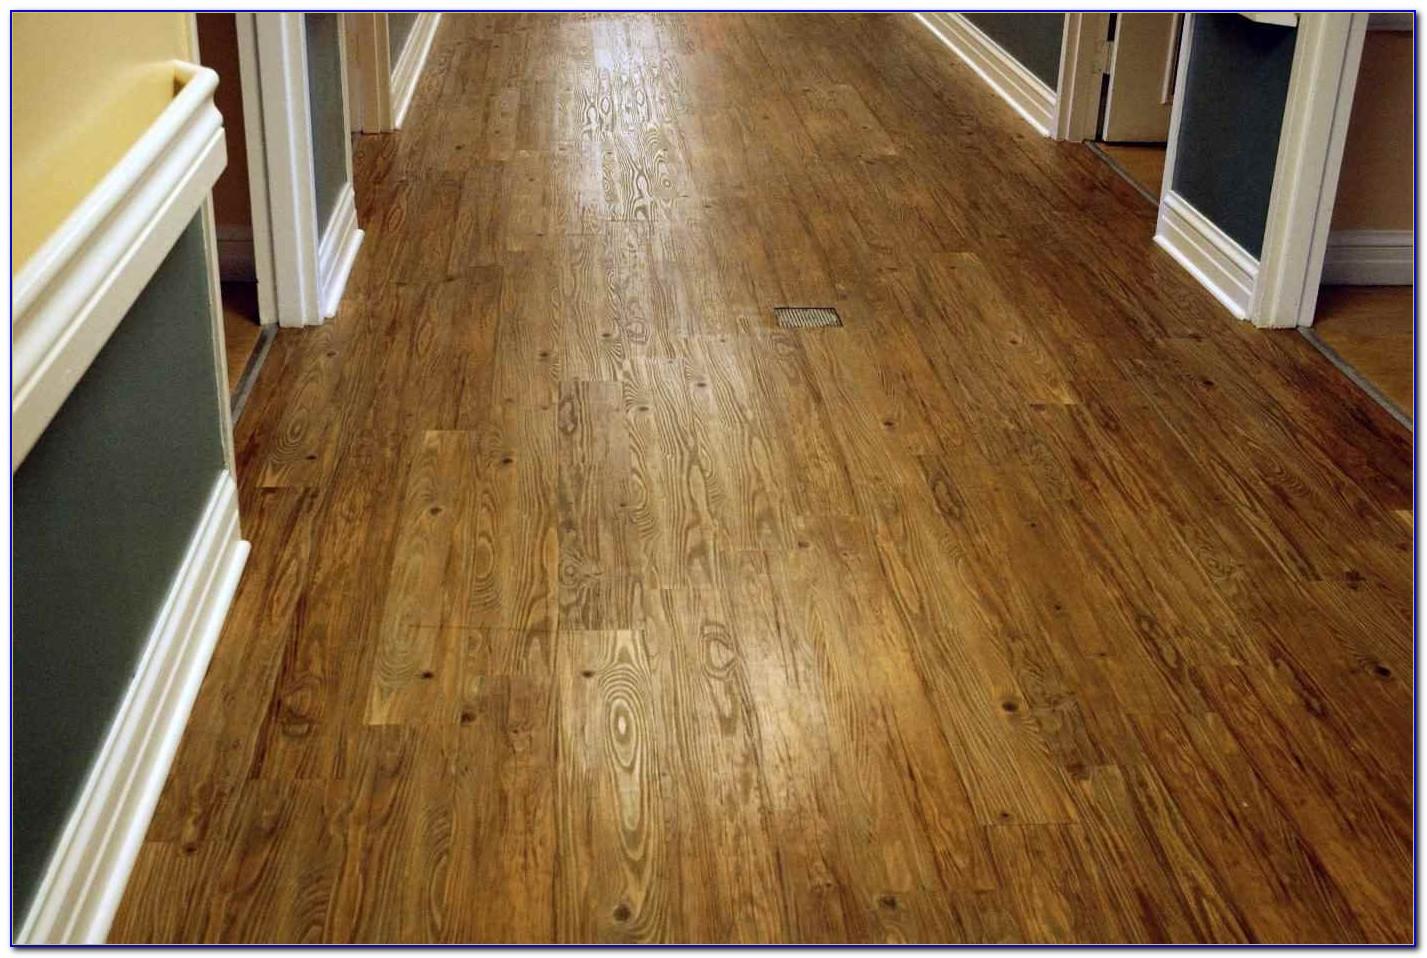 High quality laminate flooring vs hardwood flooring for Hardwood floors vs laminate